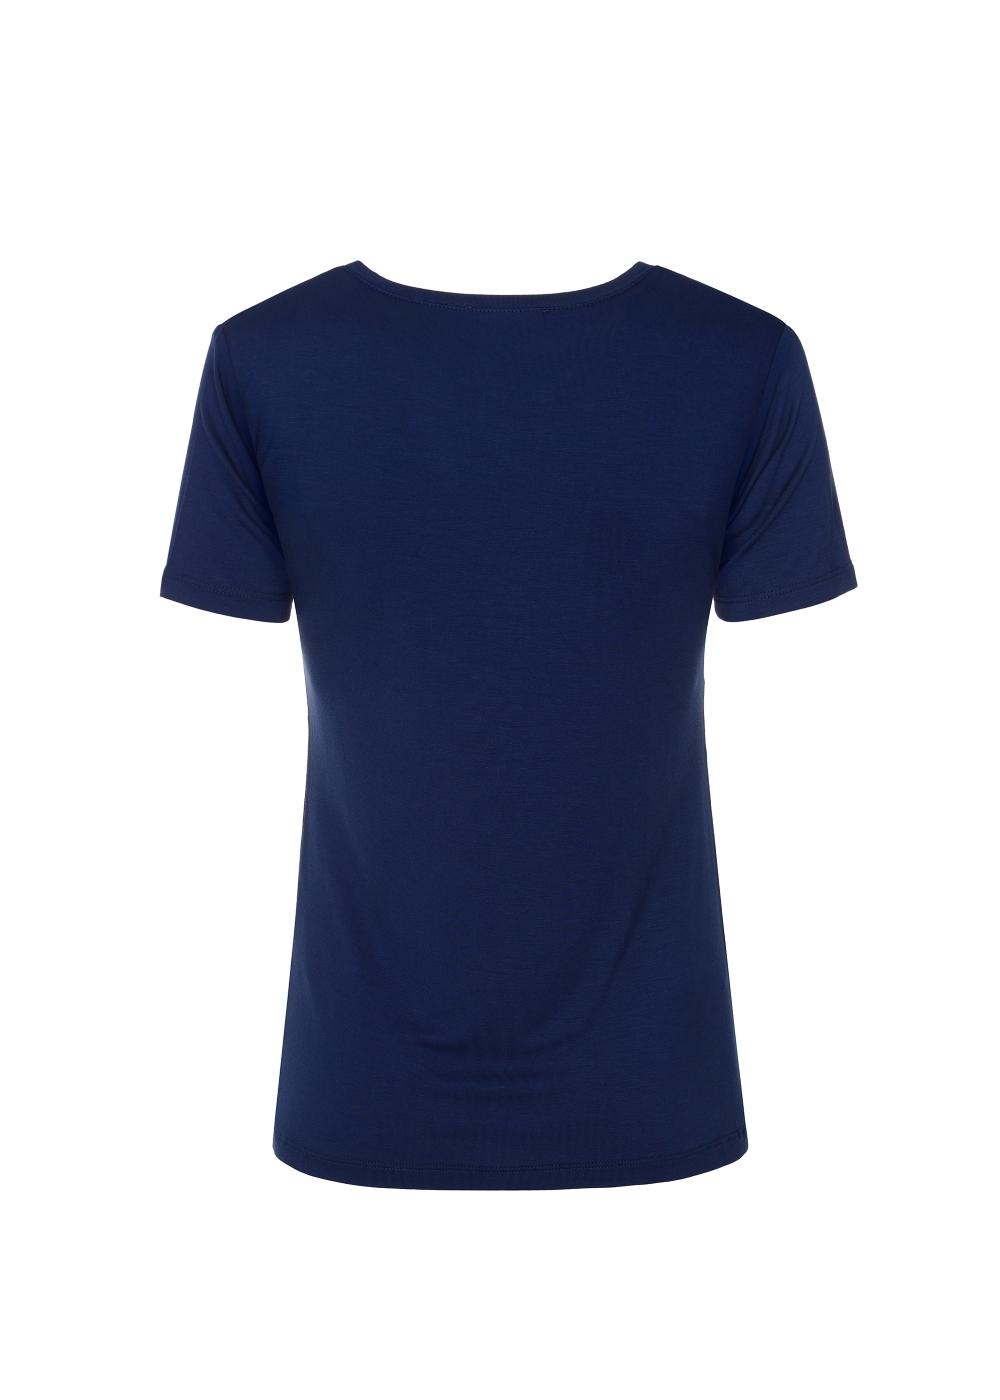 T-shirt damski TSHDT-0029-68(W19)